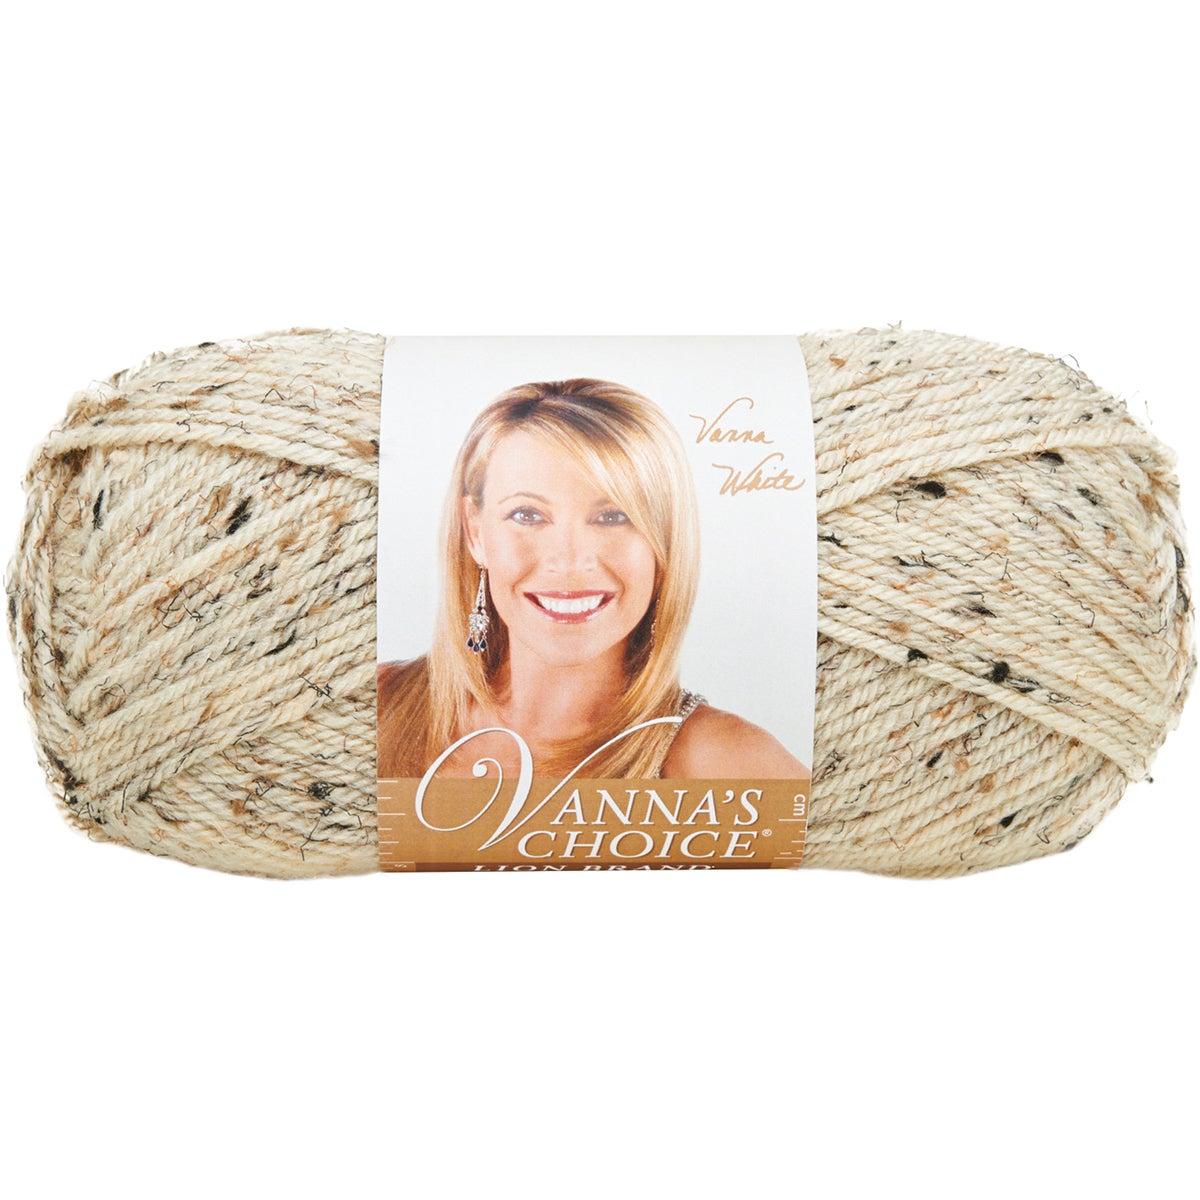 Lion Brand Vanna's Choice Yarn-Oatmeal (Oatmeal), Black